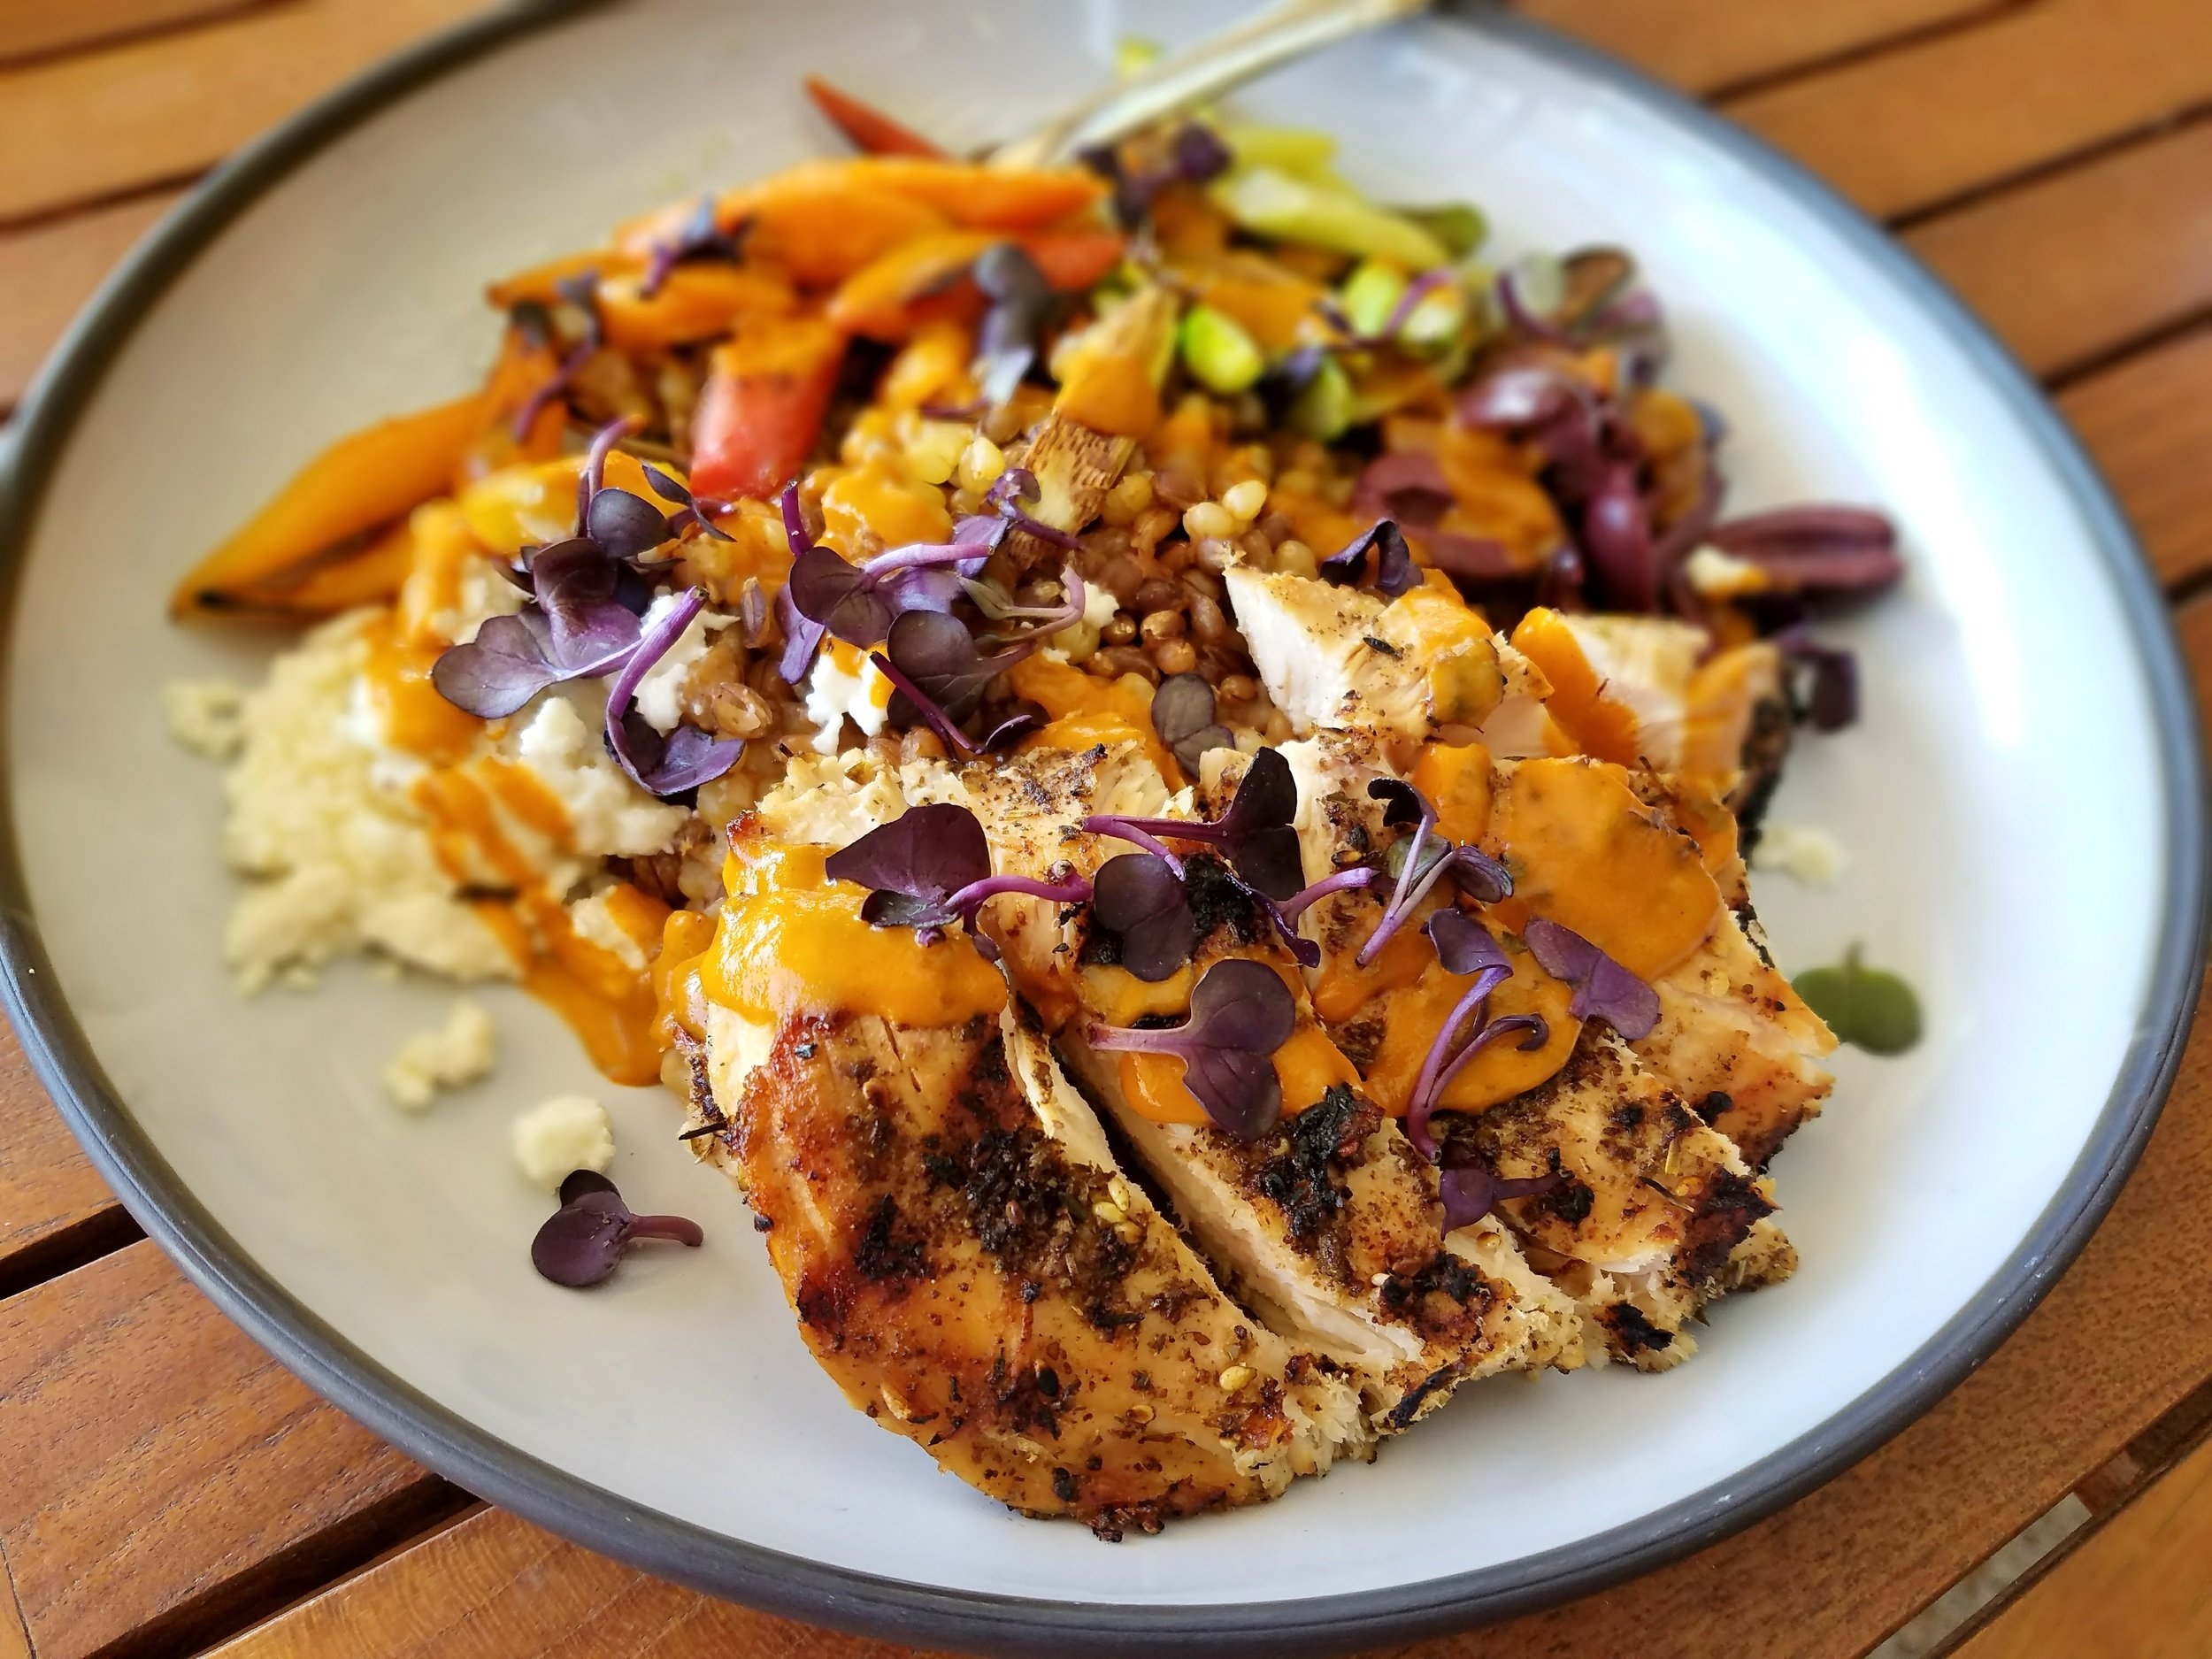 Za'atar chicken with farro, barley, feta, carrots, and asparagus